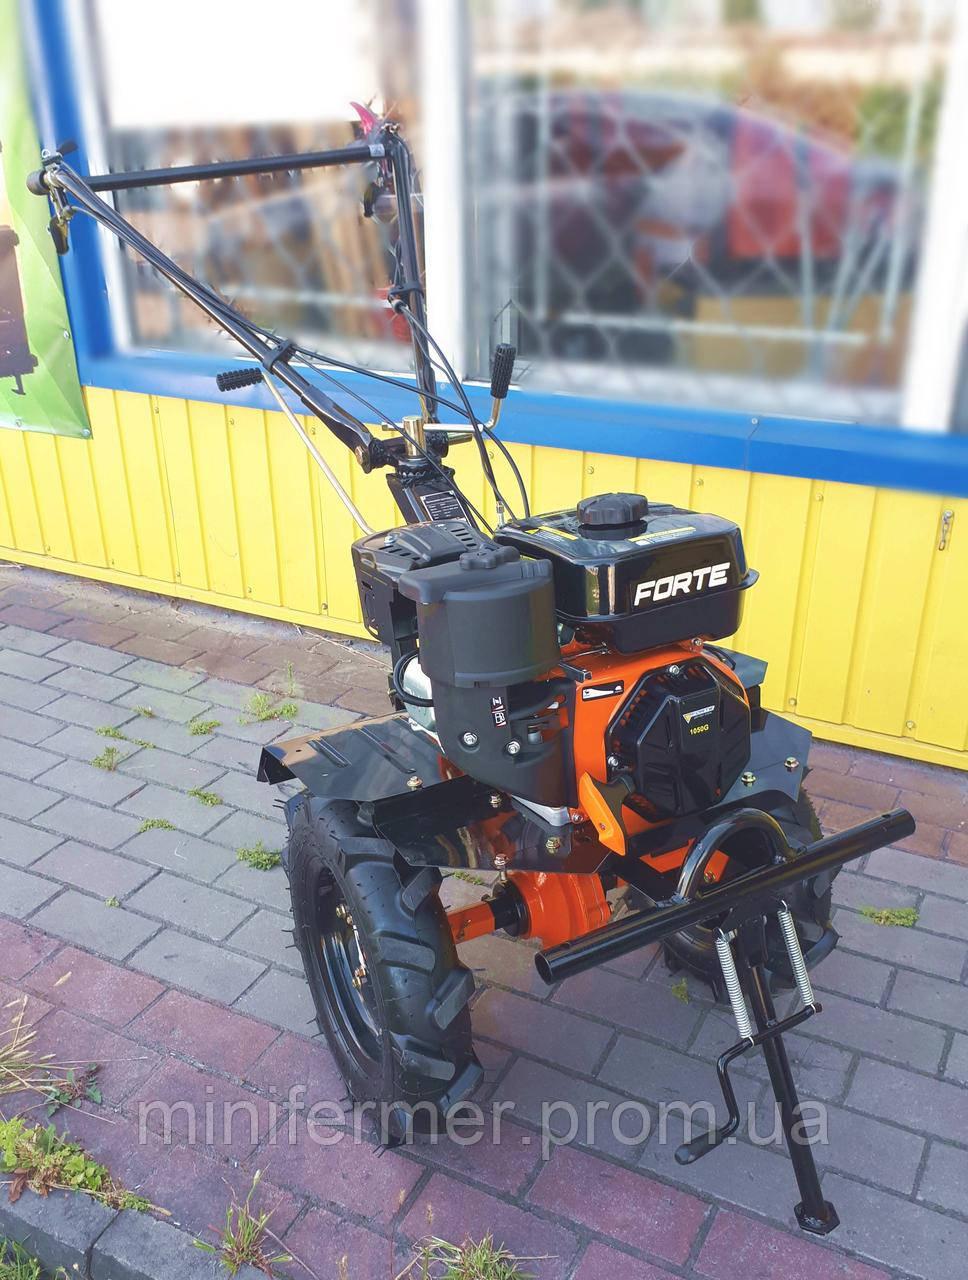 Мотоблок  FORTE 1050G бензин 7 л.с.